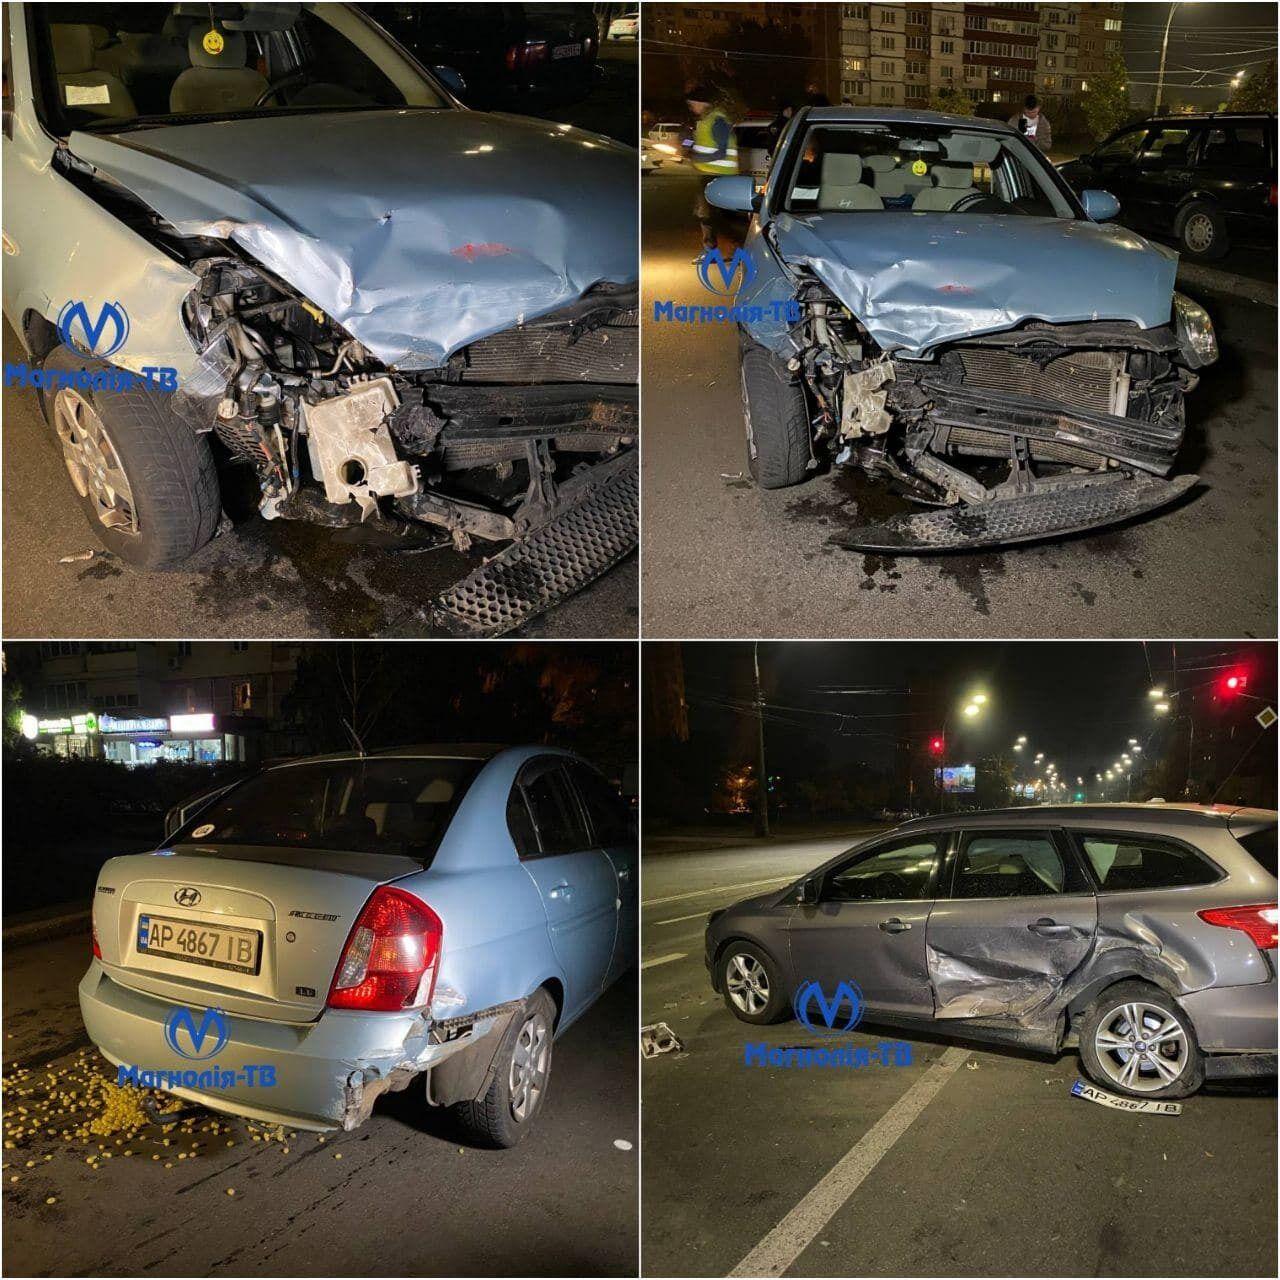 Виновник аварии протаранил три автомобиля.